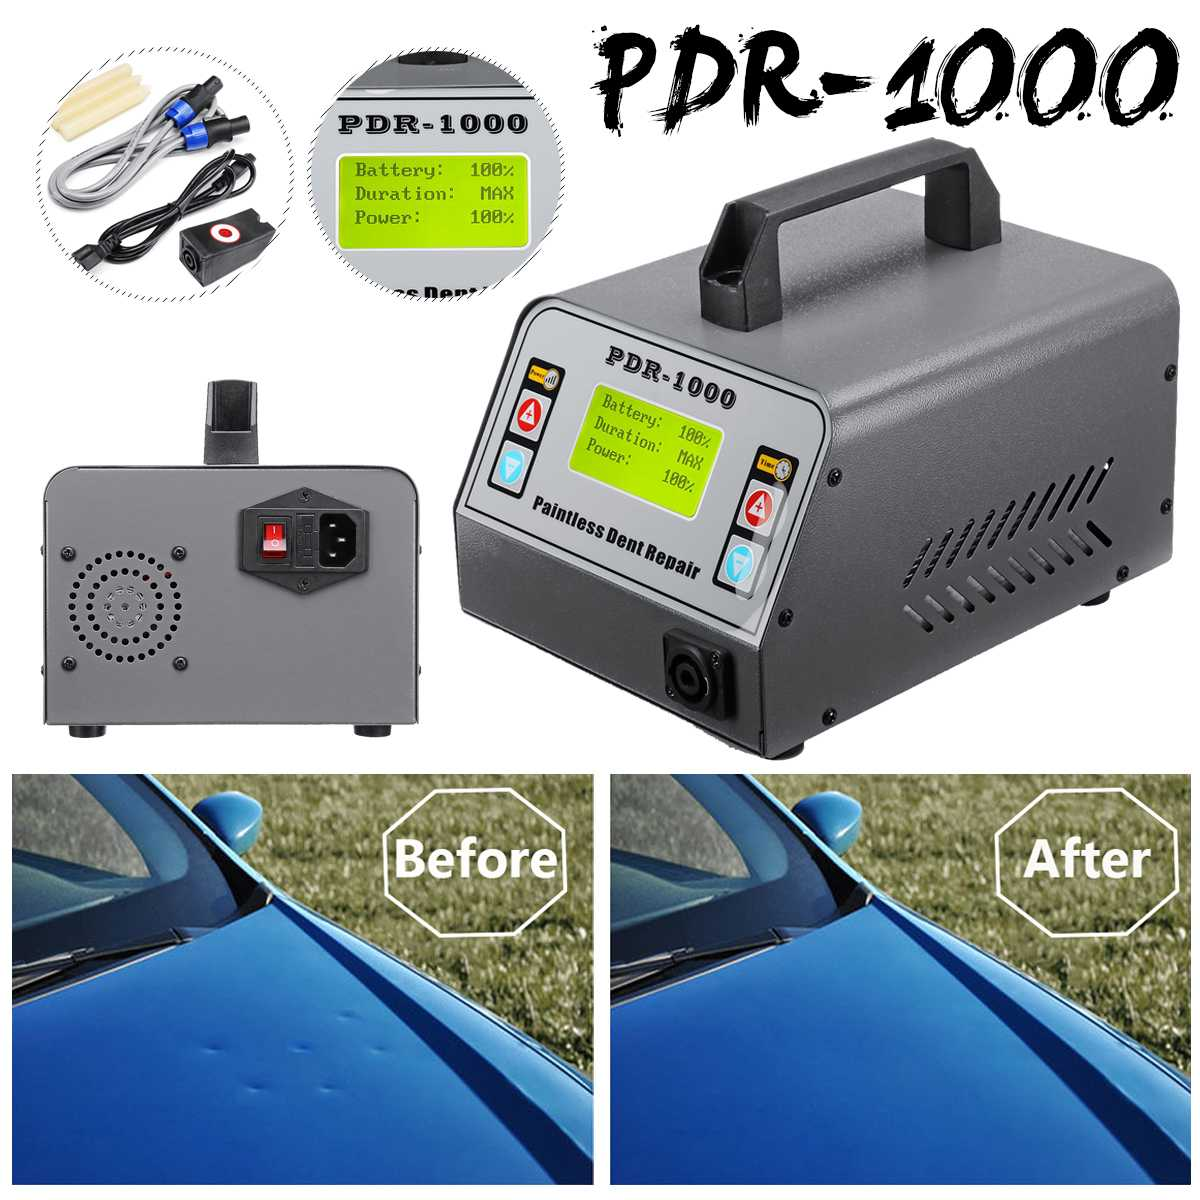 Car Dent Repair Remover Induction Heater Tool Set For Removing Dents 1000W EU/US Plug Paintless HotBox Car Body Repair Tool